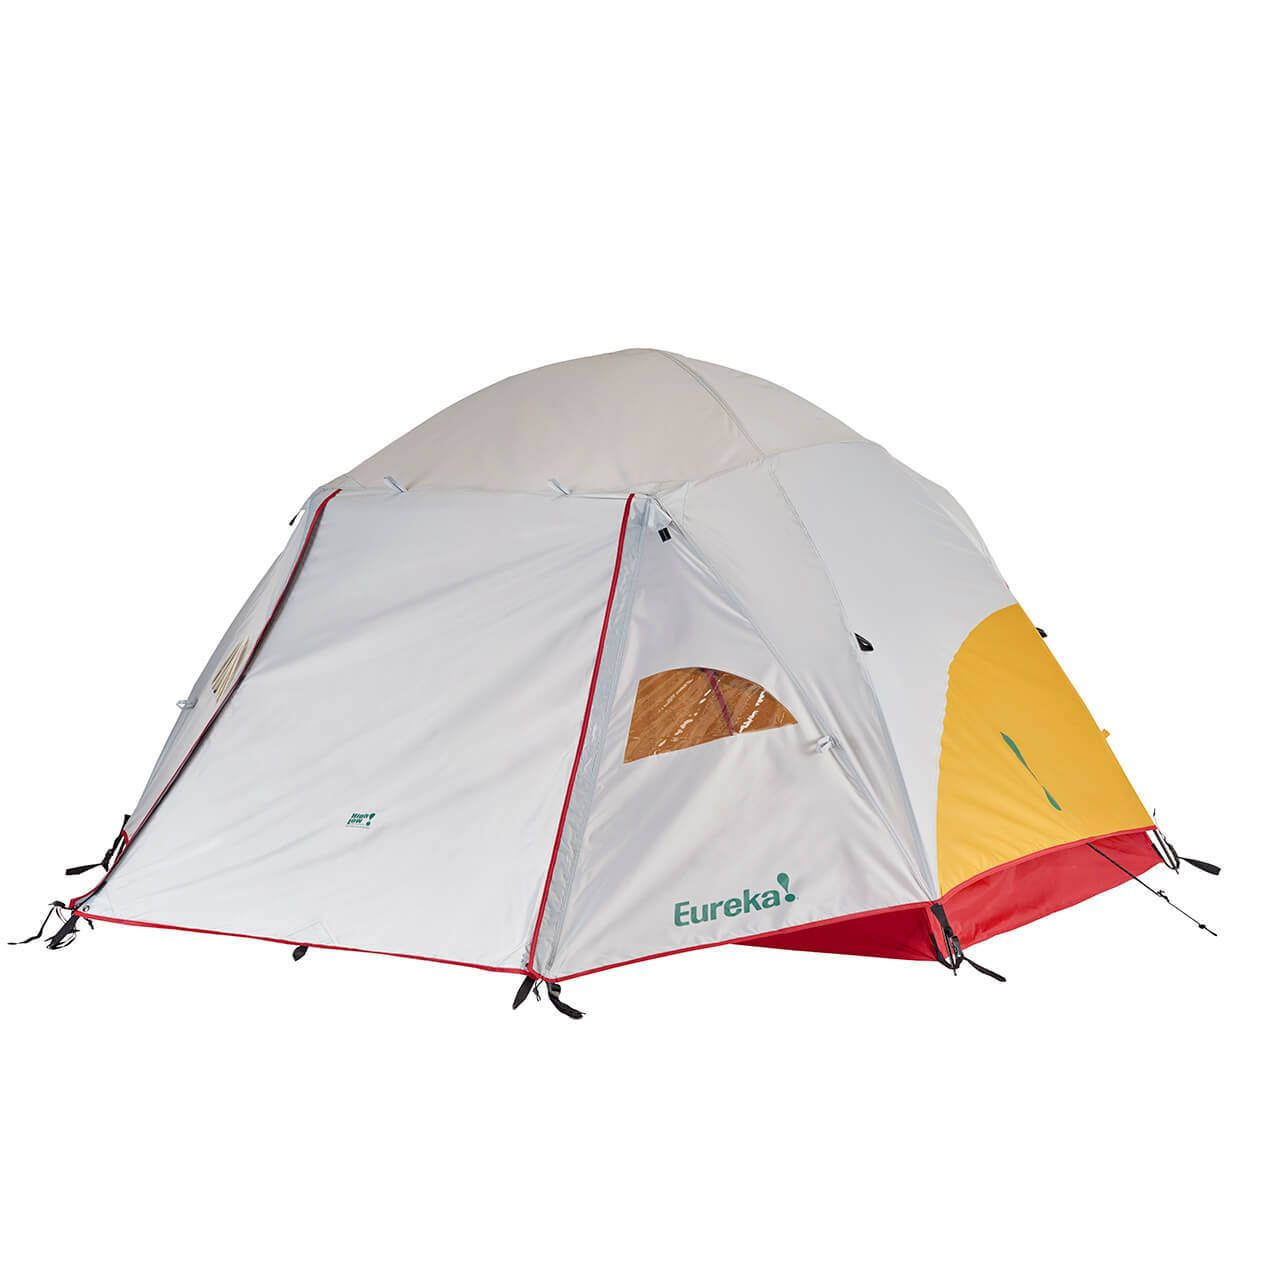 24257_24257_1.jpg  sc 1 st  Austin Kayak & Eureka Suite Dream 2 Tent - 2 Person